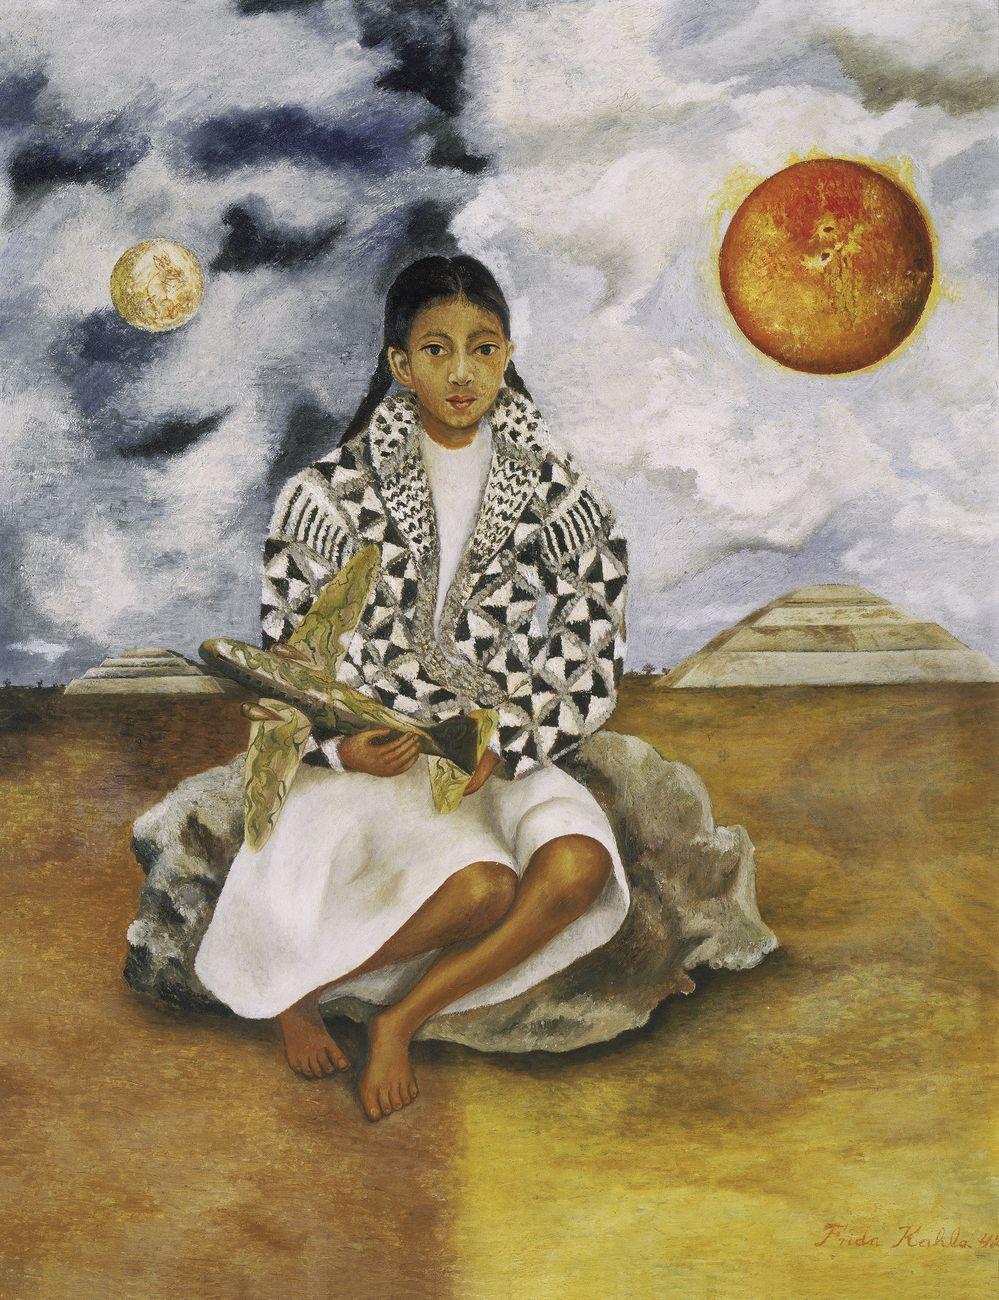 Frida Kahlo, Bimba tehuacana, Lucha María (Sole e luna), 1942. Collezione Juan Antonio Péréz Simon. Photo © Rafael Doniz. Credits © Banco de México Diego Rivera Frida Kahlo Museums Trust, México, D.F. by SIAE 2018